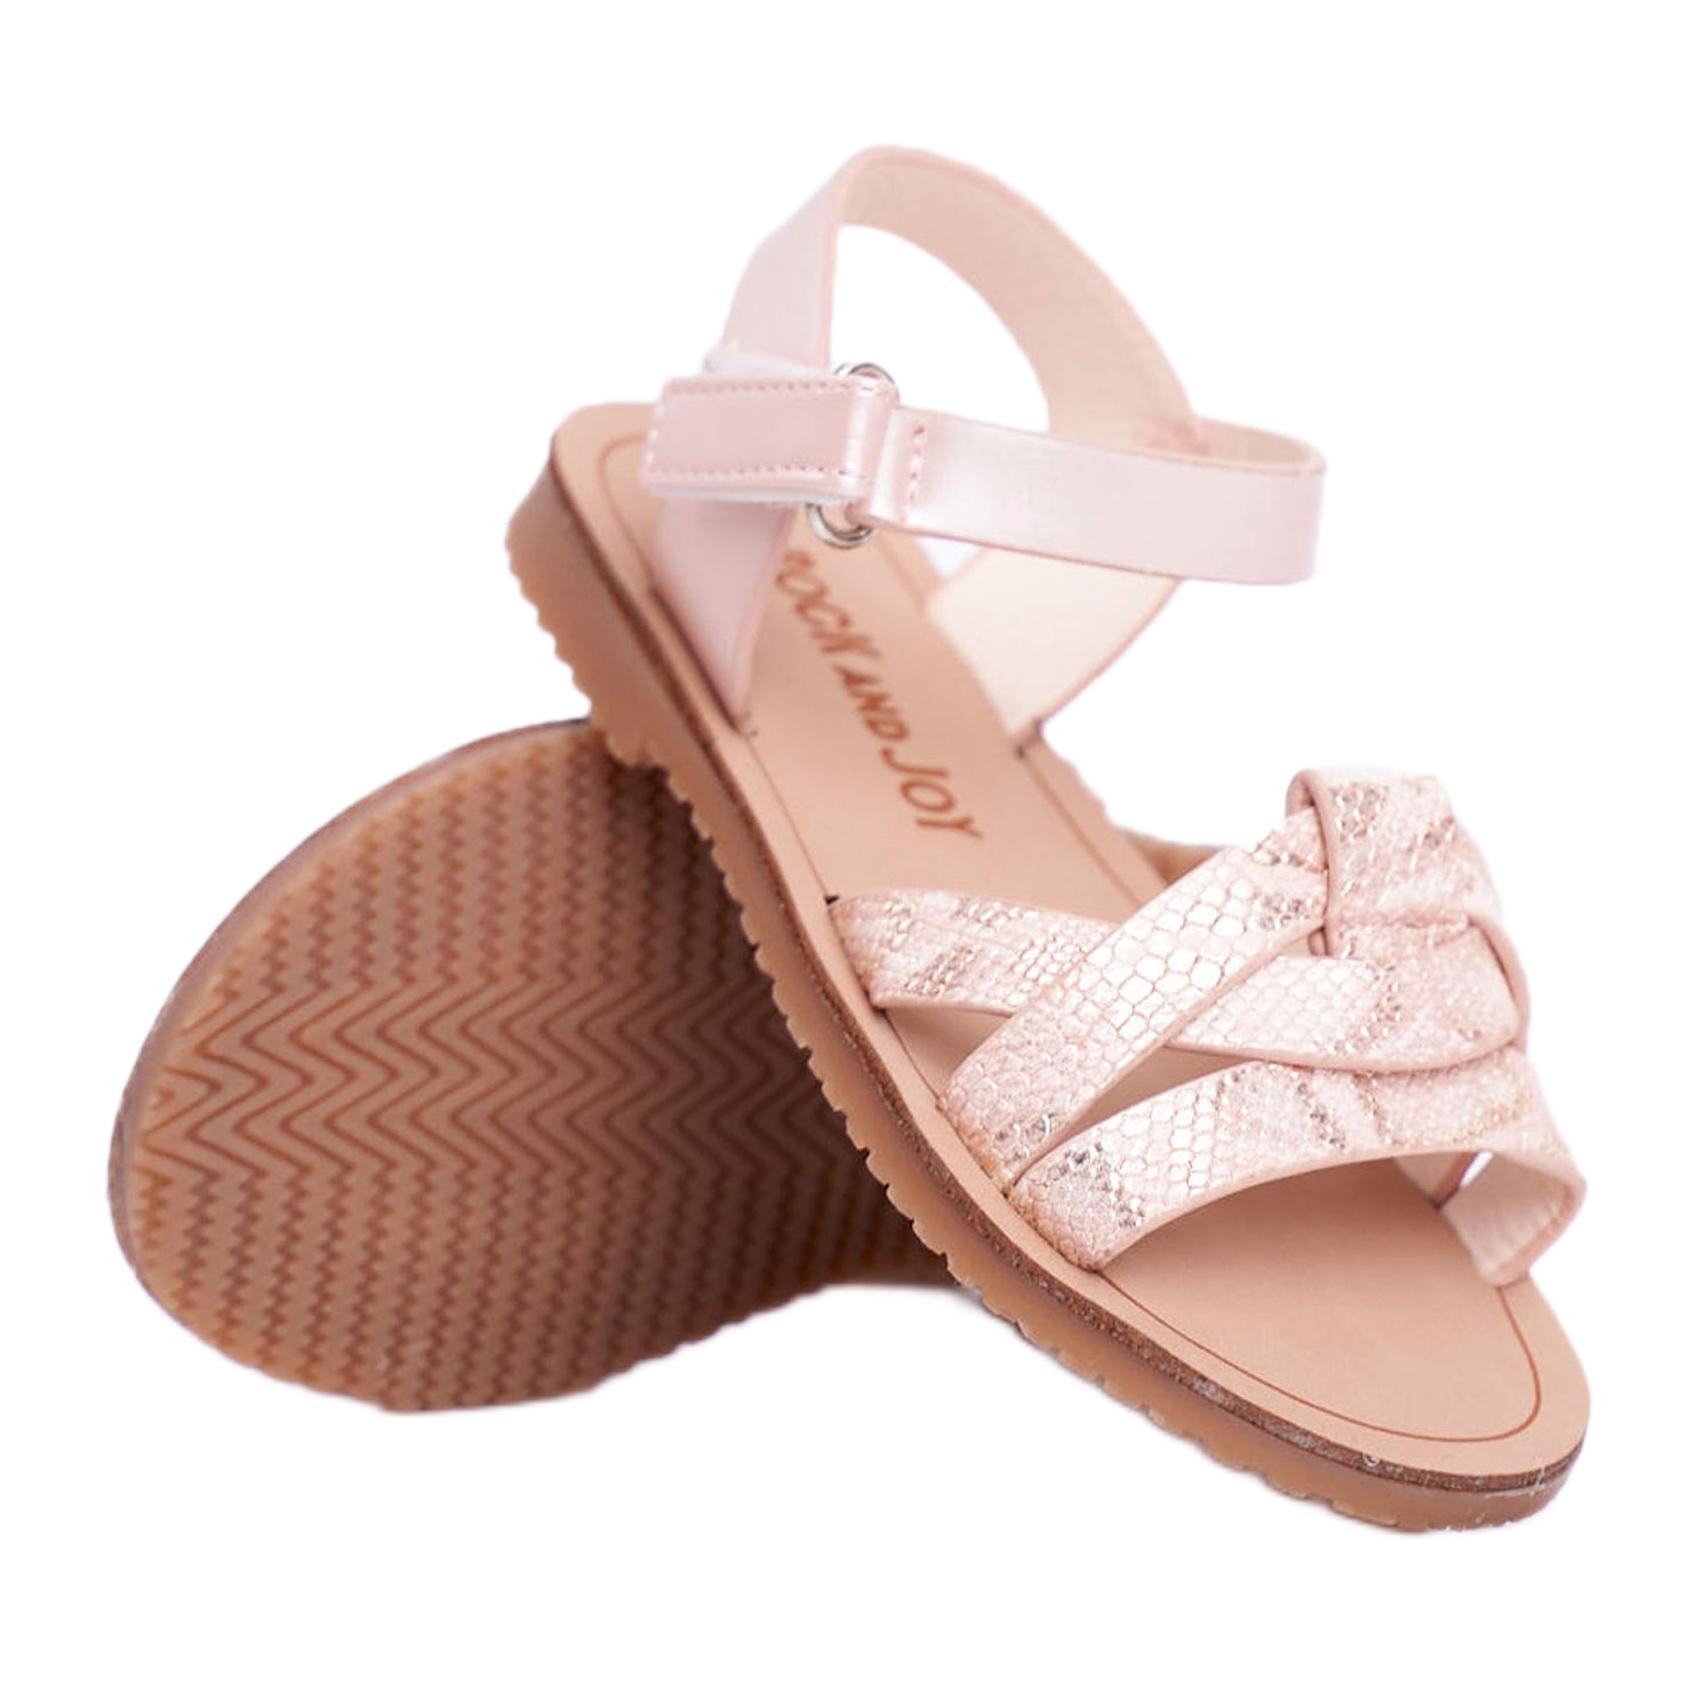 FRROCK-sandali-calzature-per-bambini-bambini-rosa-giallo-eco-pelle